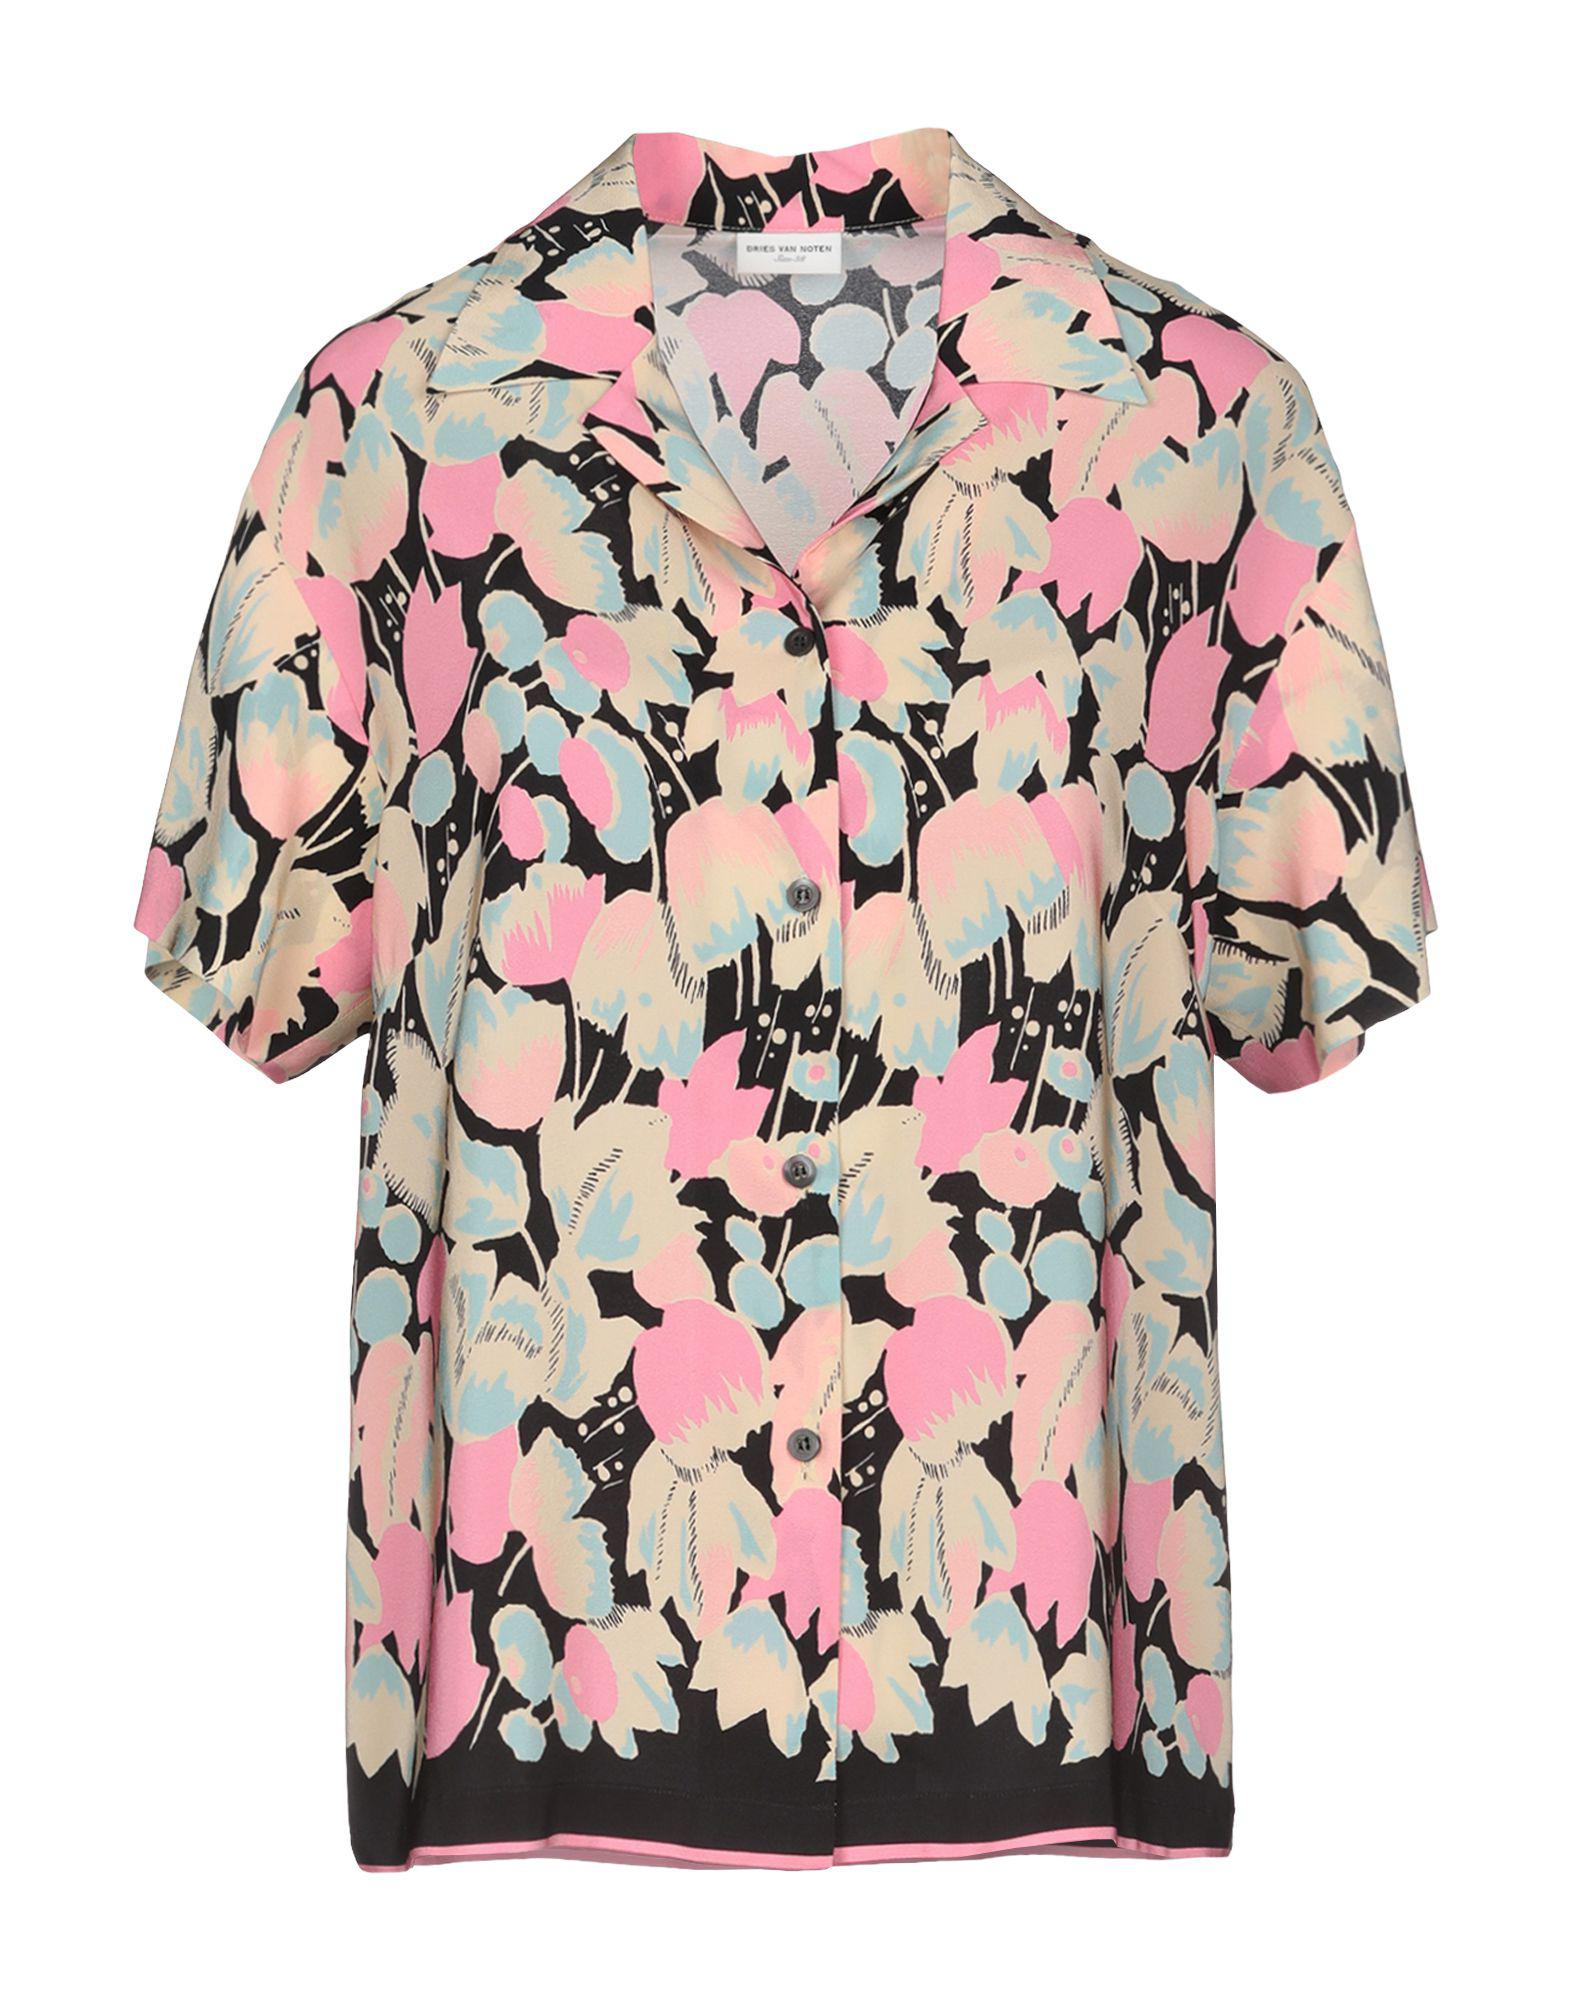 40ade7bb83bb8 Dries Van Noten Shirt in Pink - Lyst